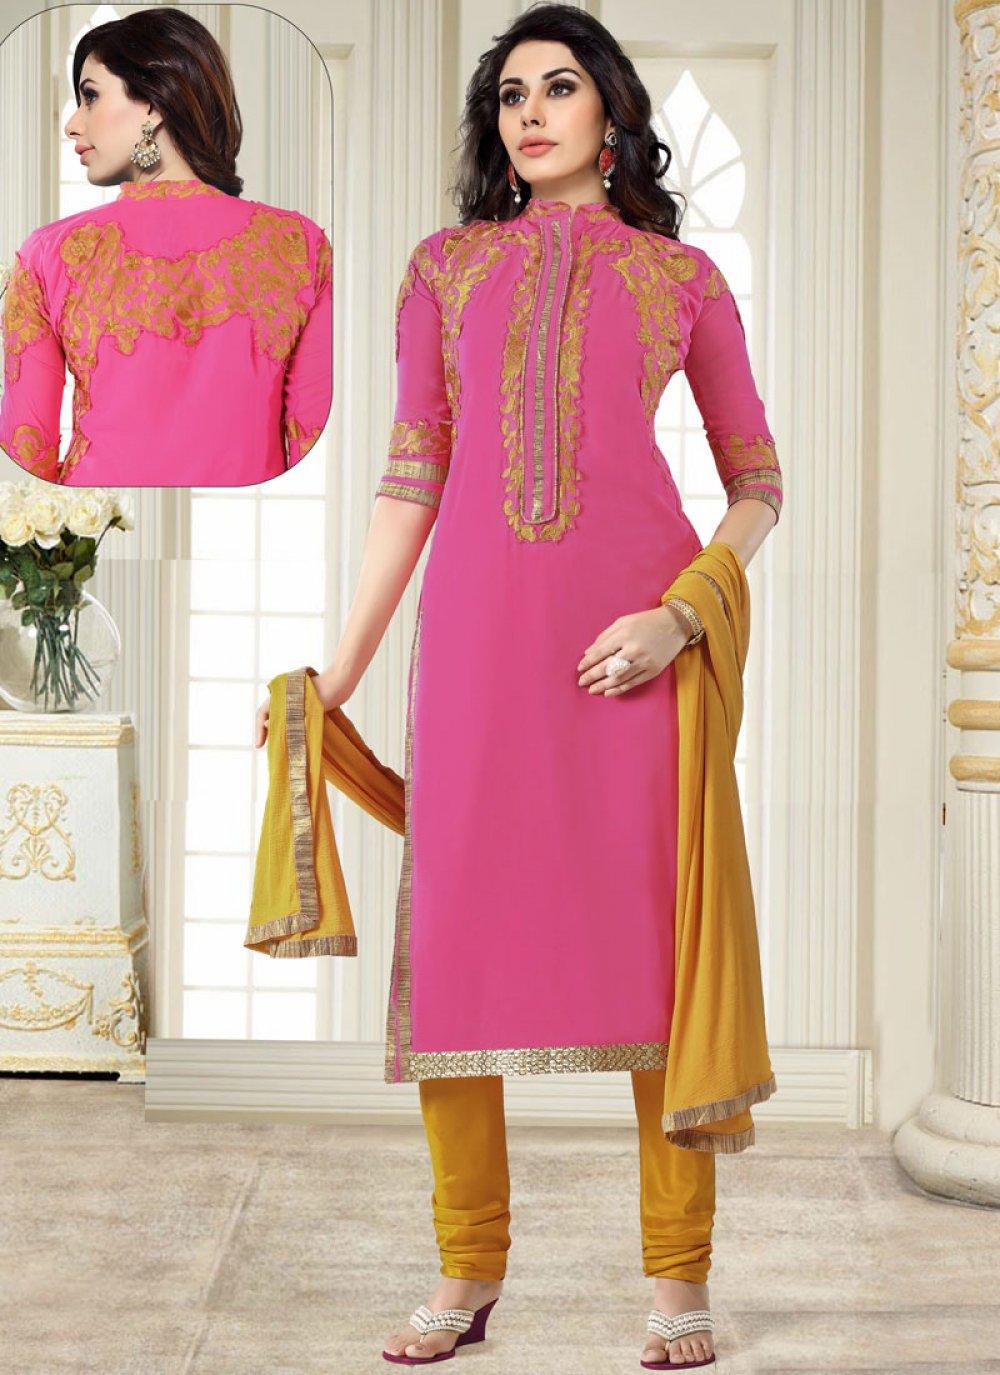 Georgette Embroidered Churidar Salwar Suit in Pink